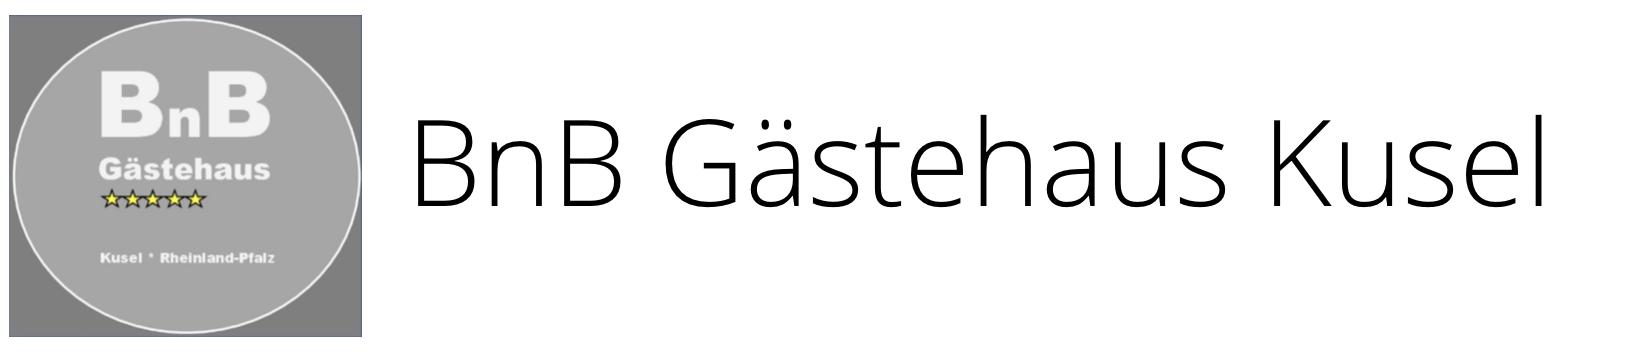 BnB Gästehaus Kusel Logo